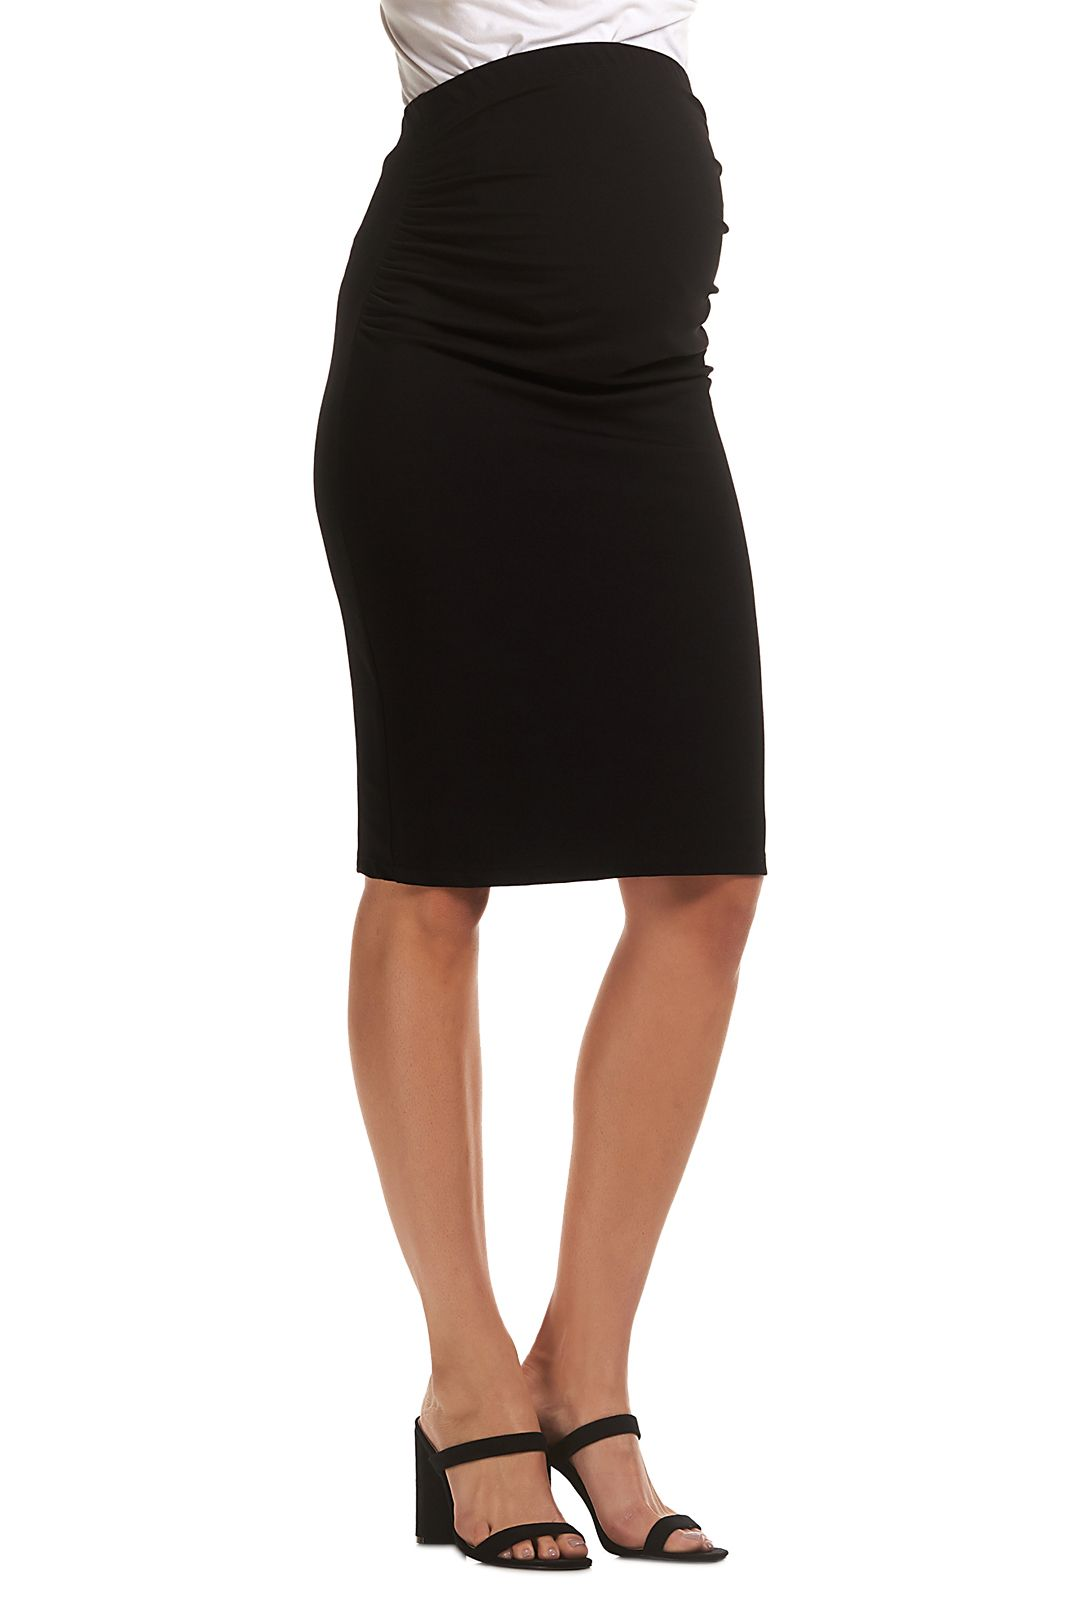 Soon-Maternity-Midi-Work-Skirt-Black-Side